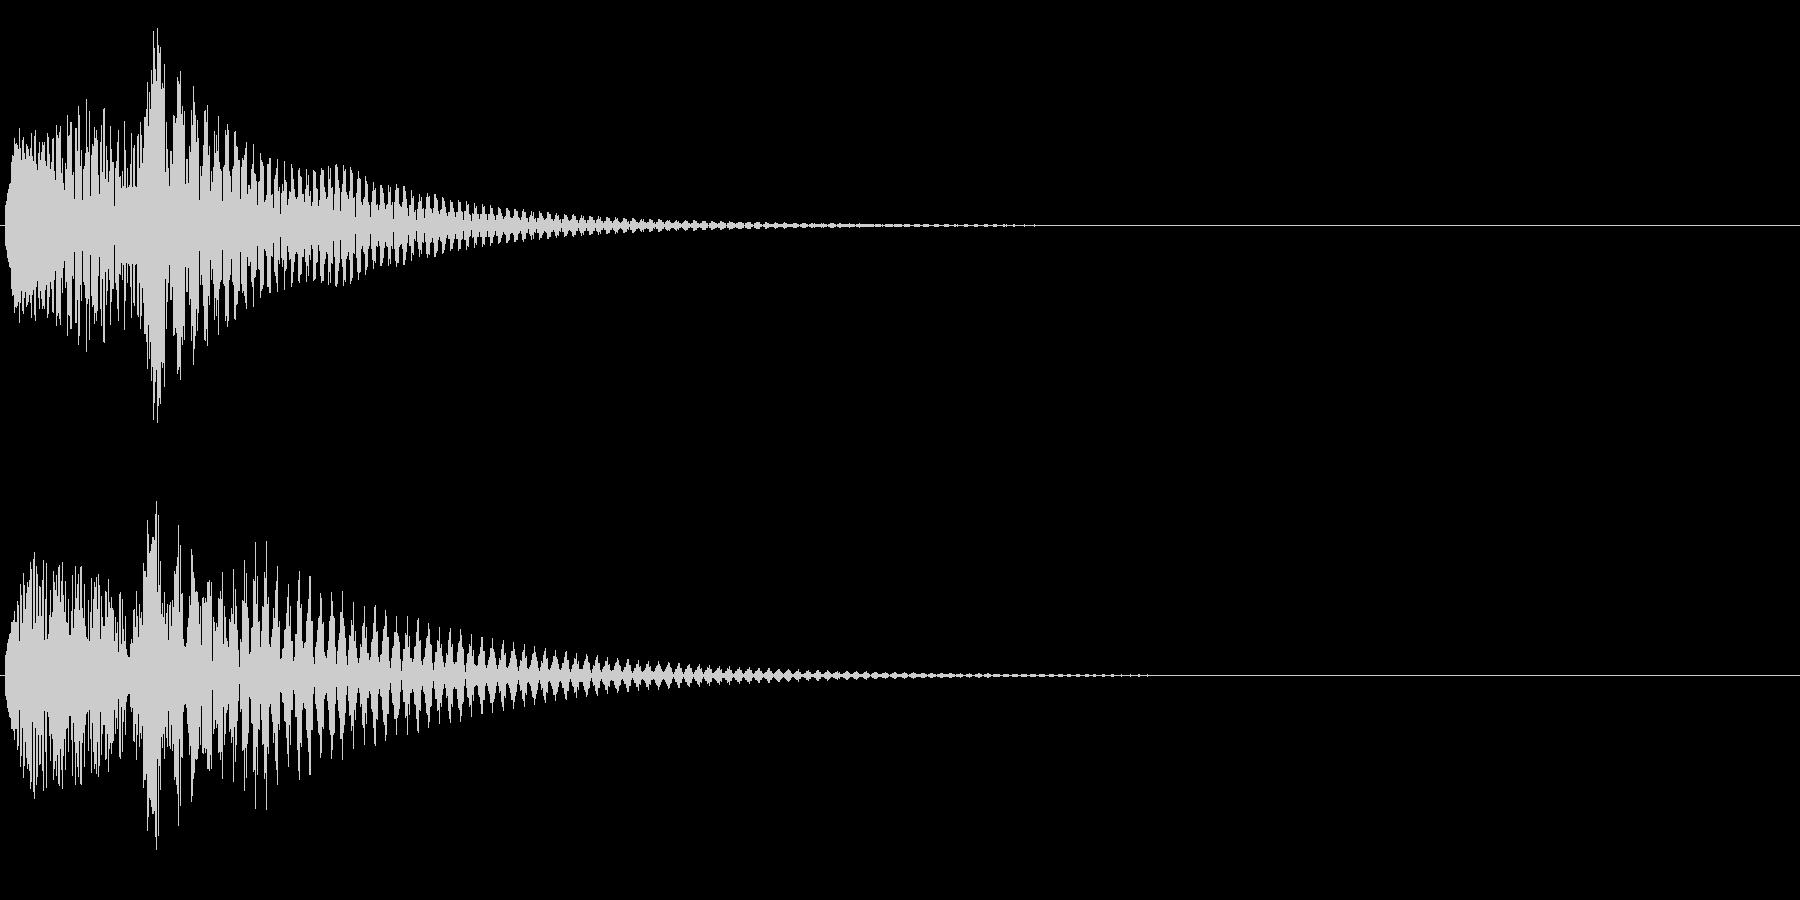 Baby 幼児玩具向け可愛い電子音5の未再生の波形